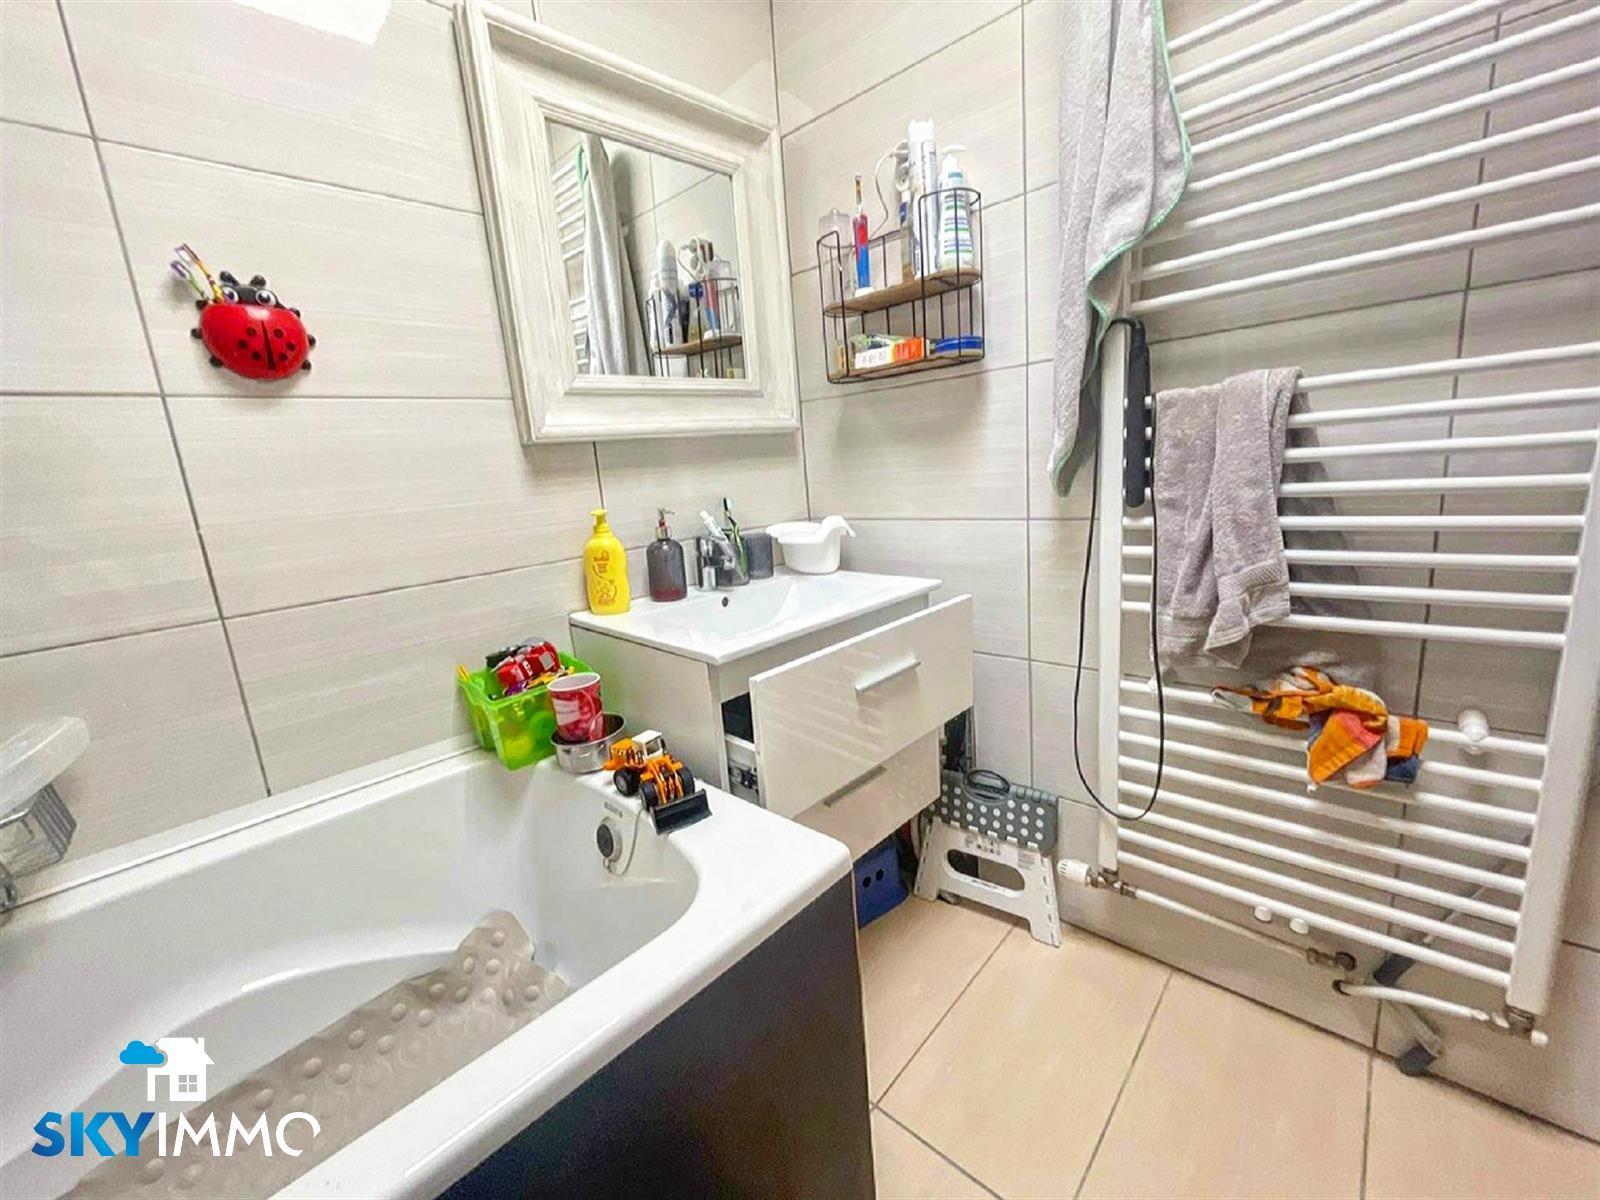 Maison - Seraing Jemeppesur-Meuse - #4343977-9